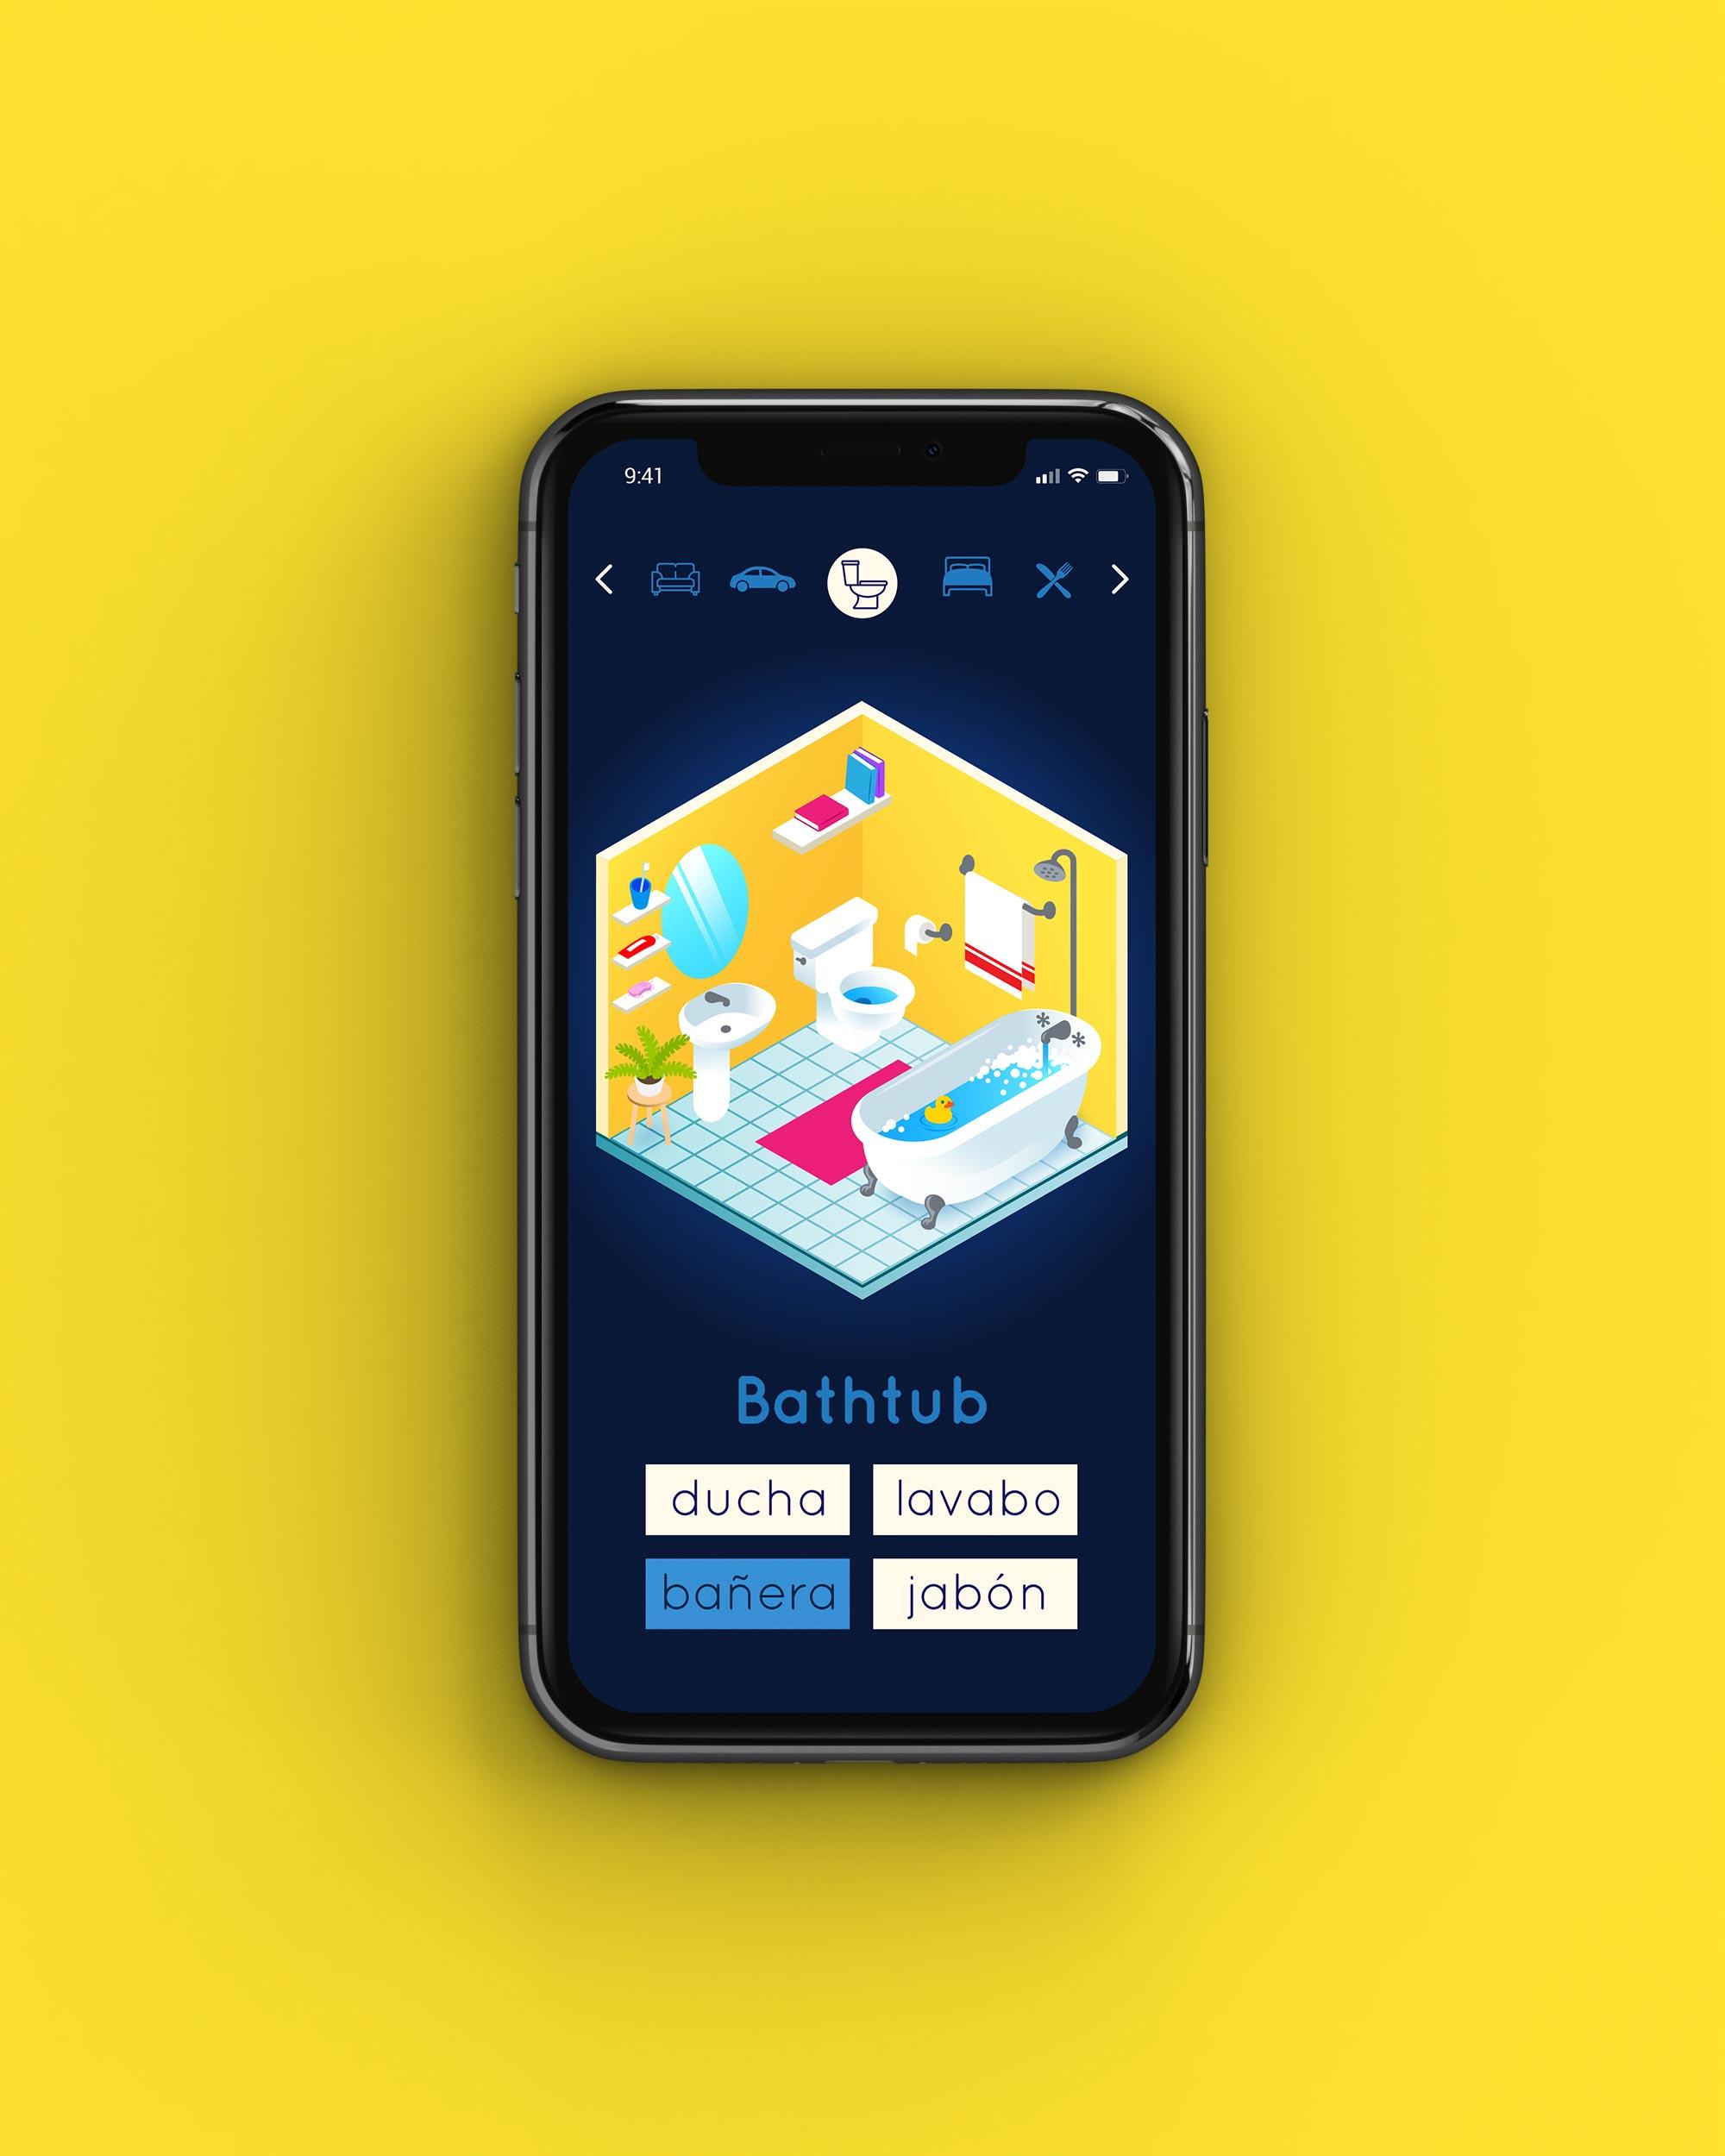 phone-isometric-game-layout.jpg